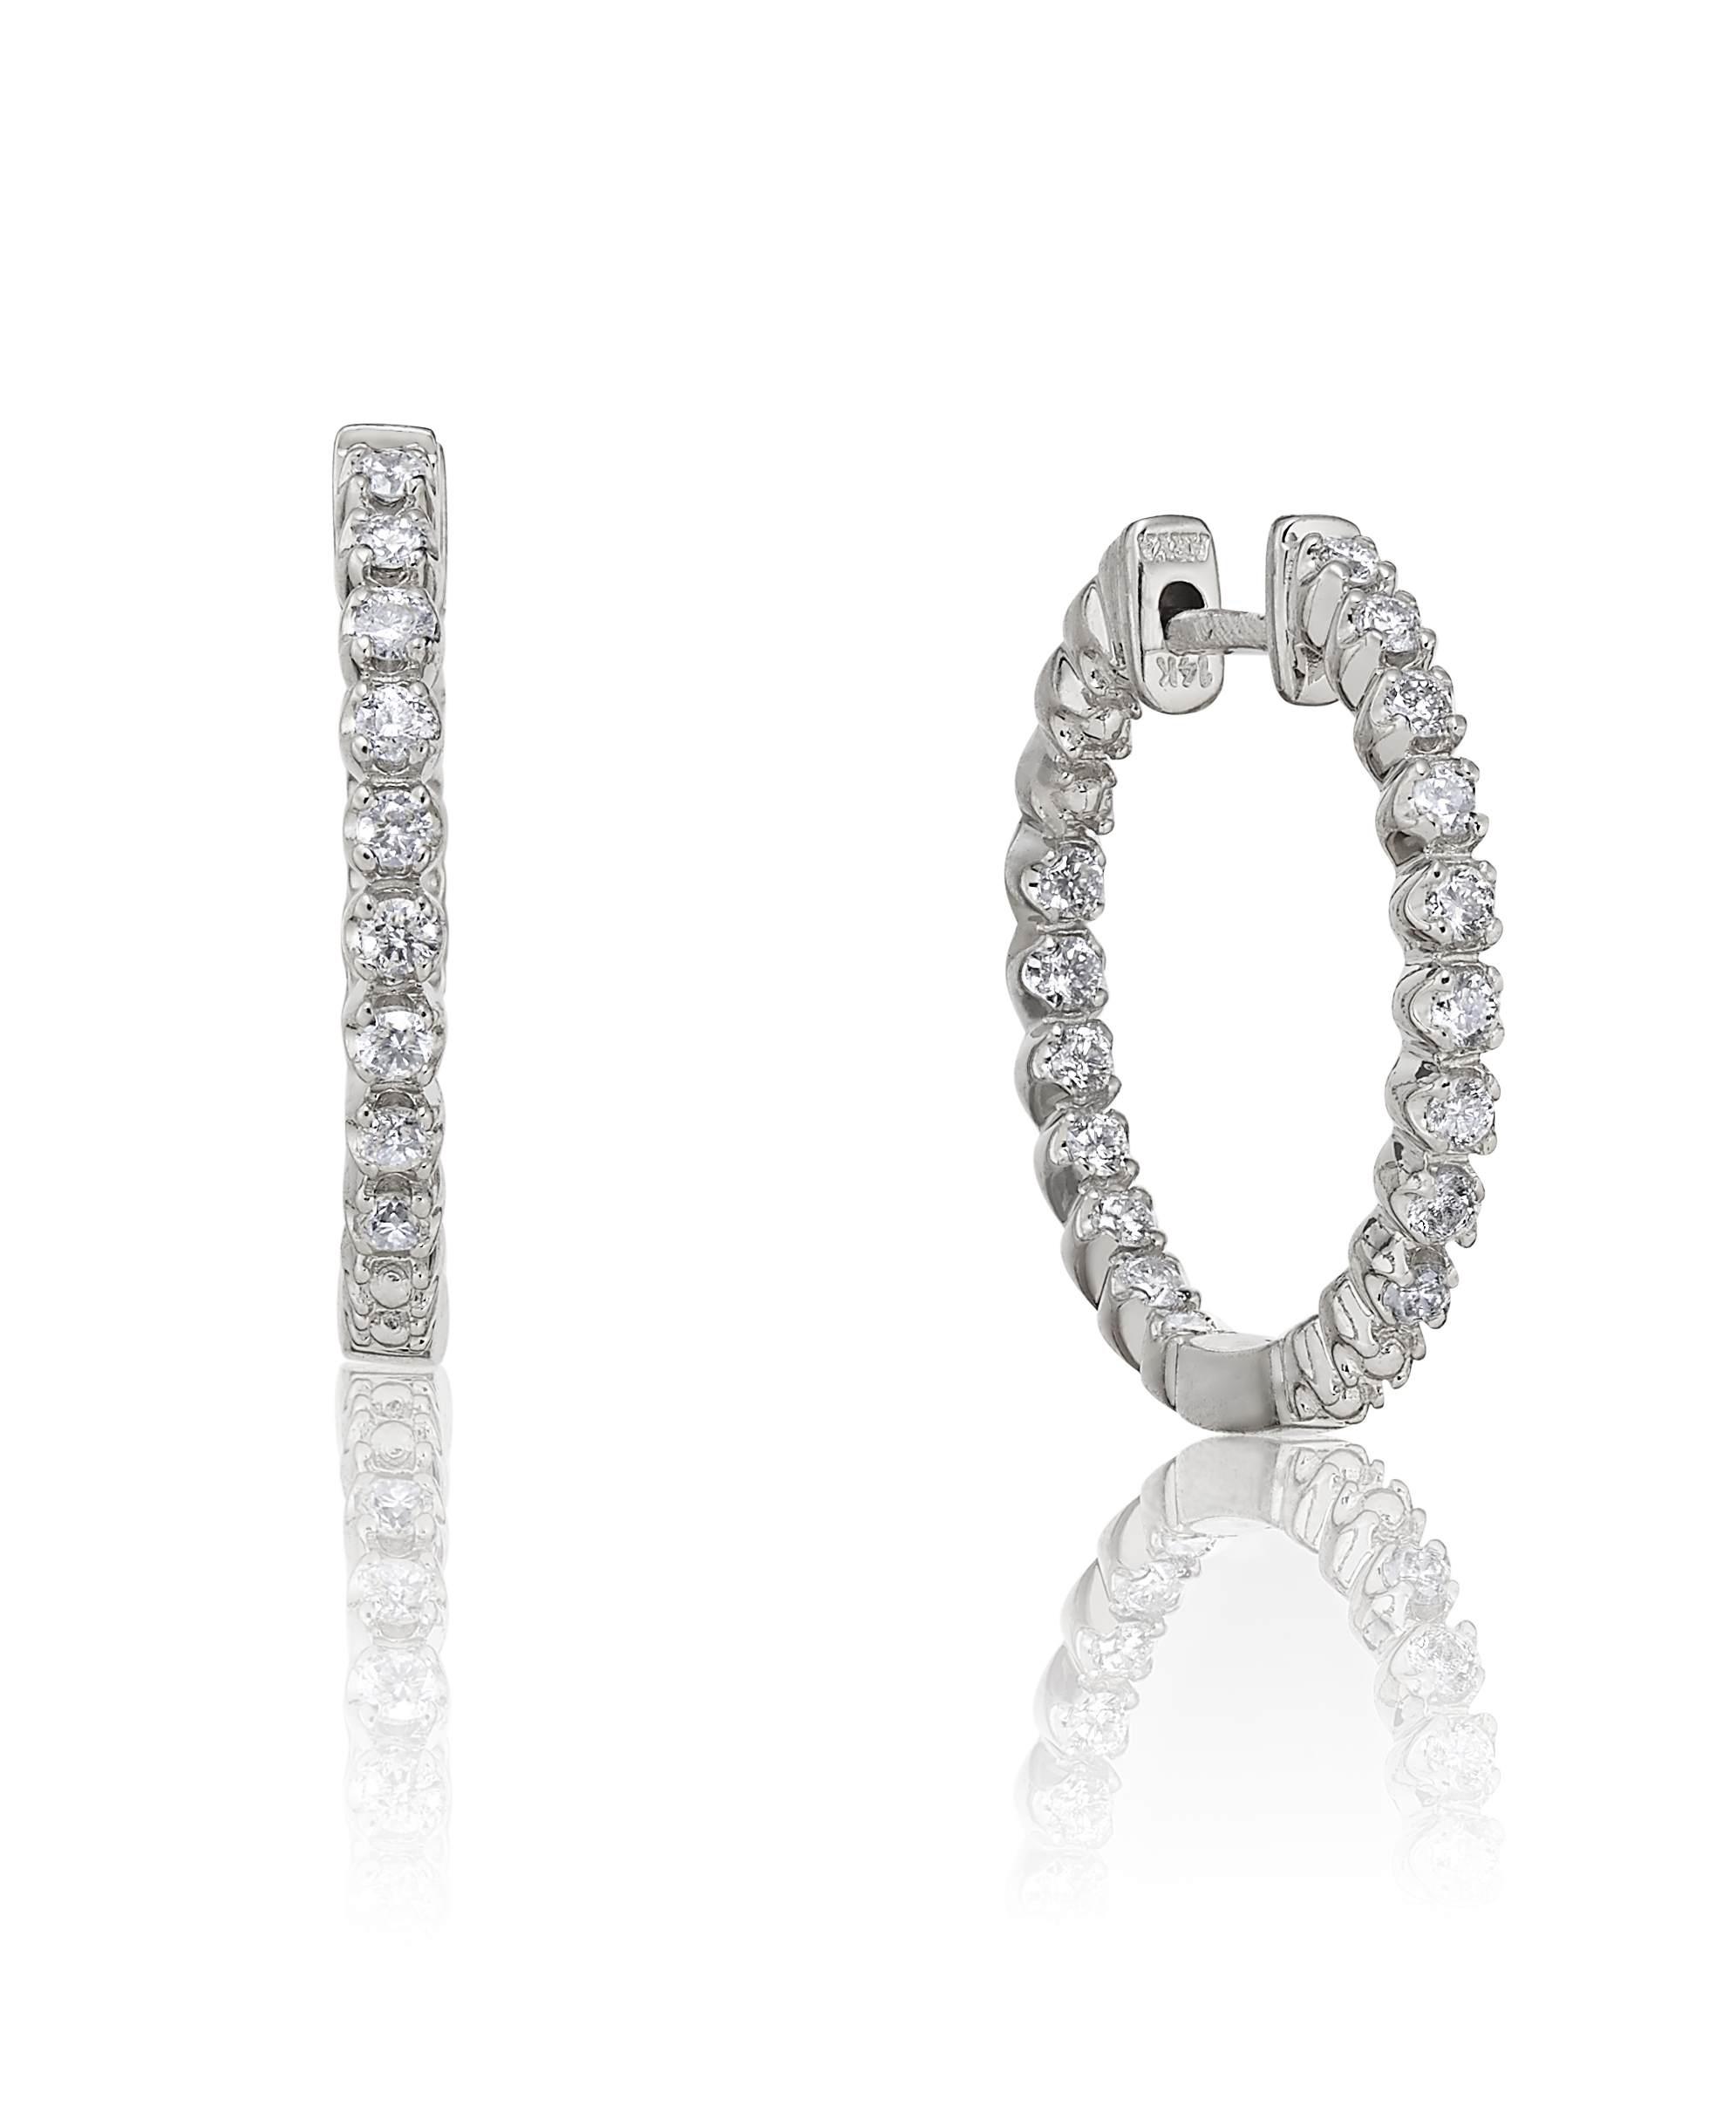 diamond_earrings_macys.jpg